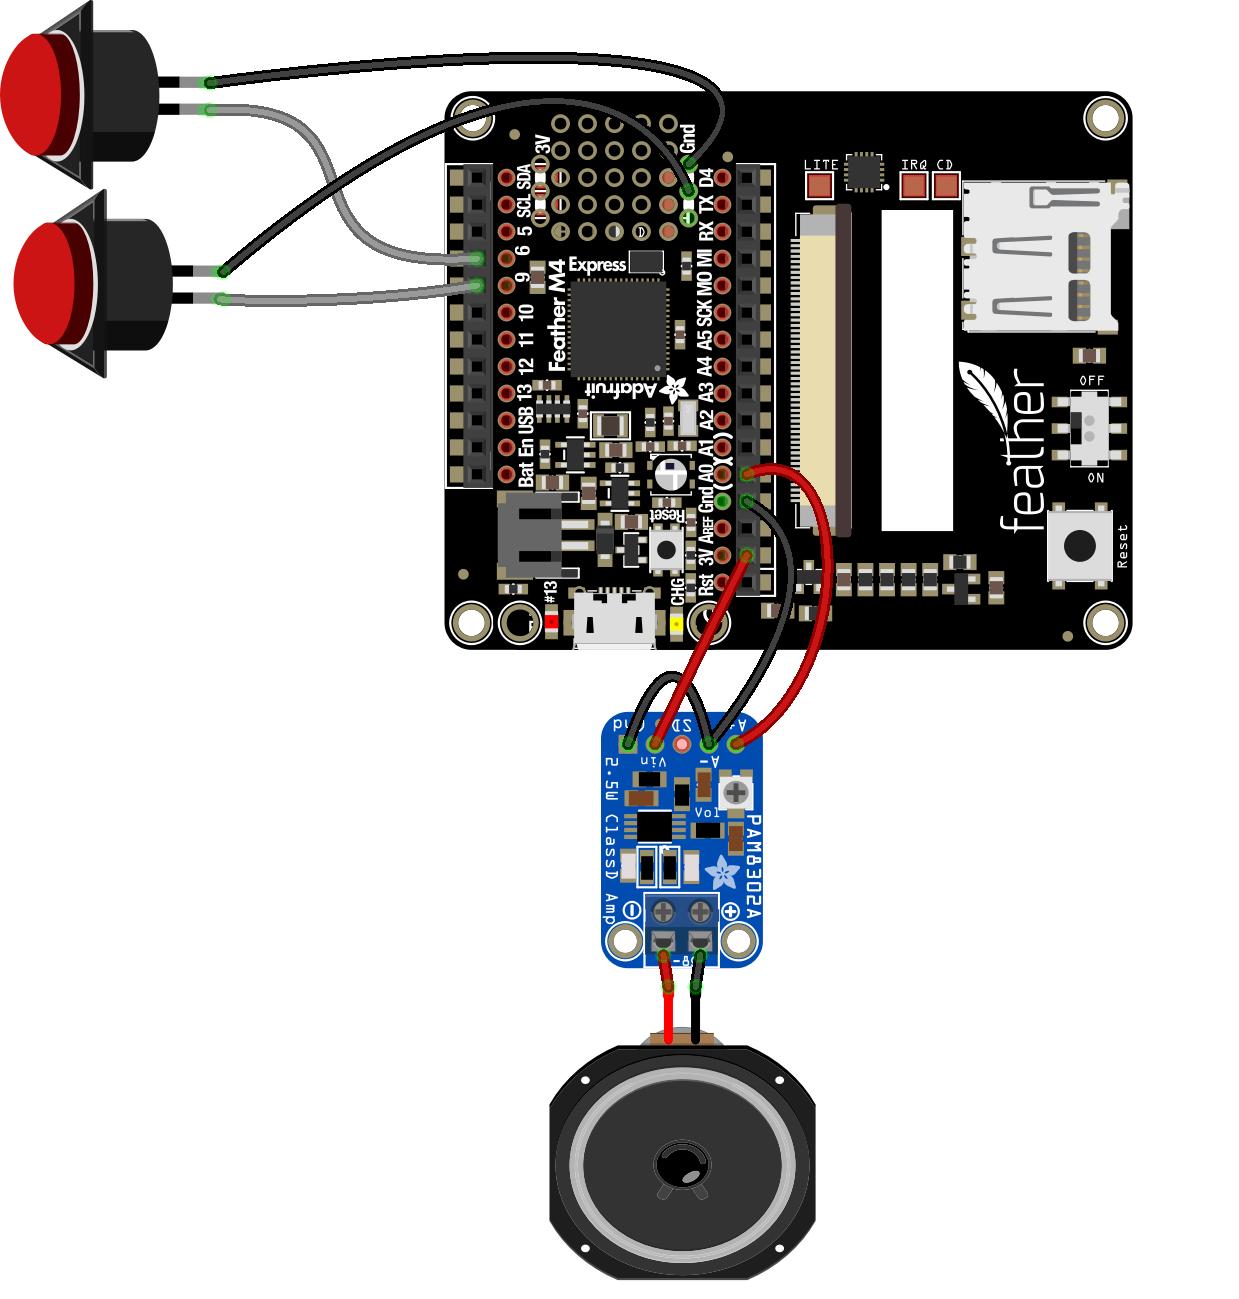 circuitpython_Slideshow_Feather_M4_2_copy.png